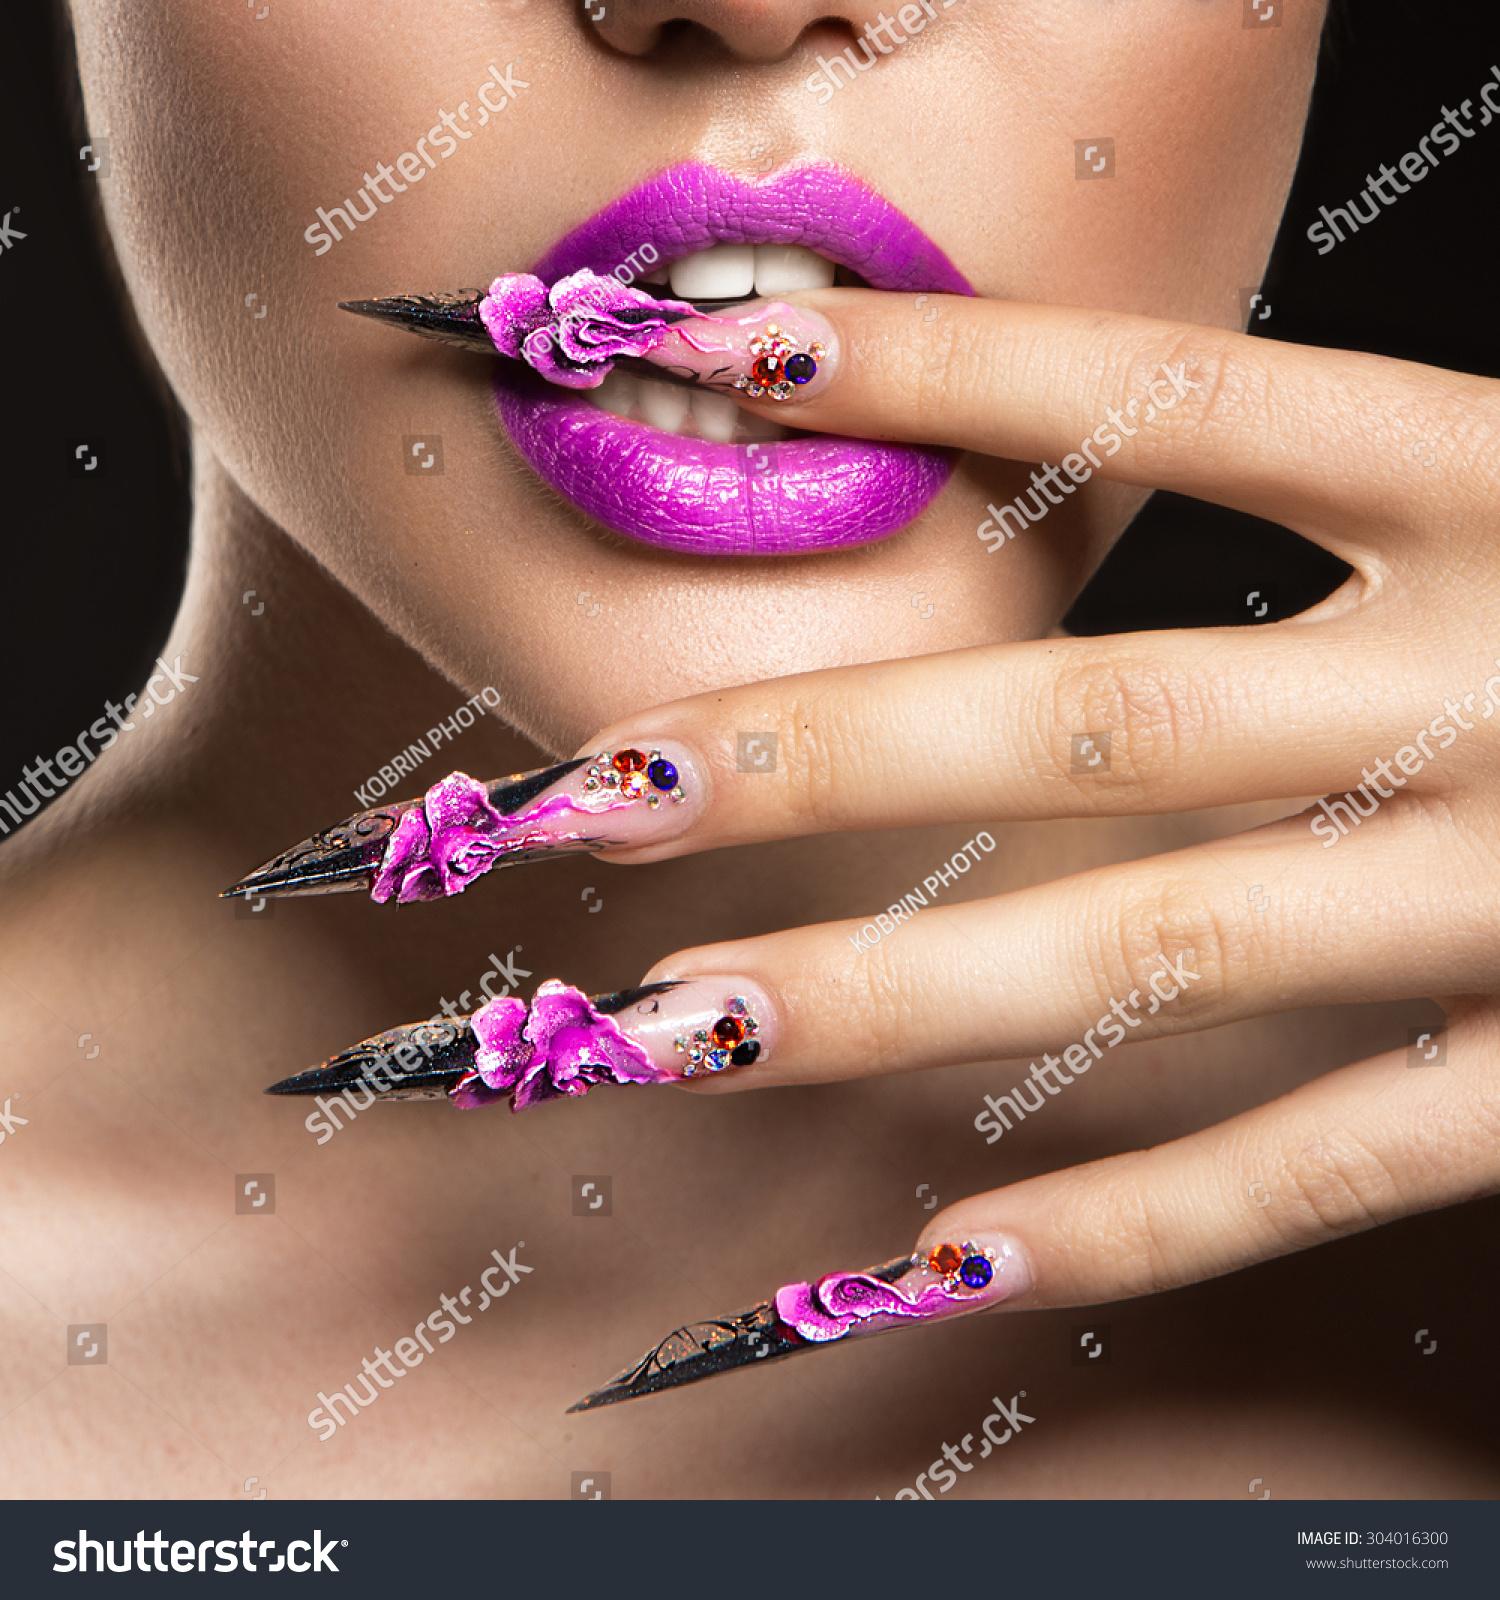 Beautiful Girl Mask Long Nails Sensual Stock Photo (Safe to Use ...